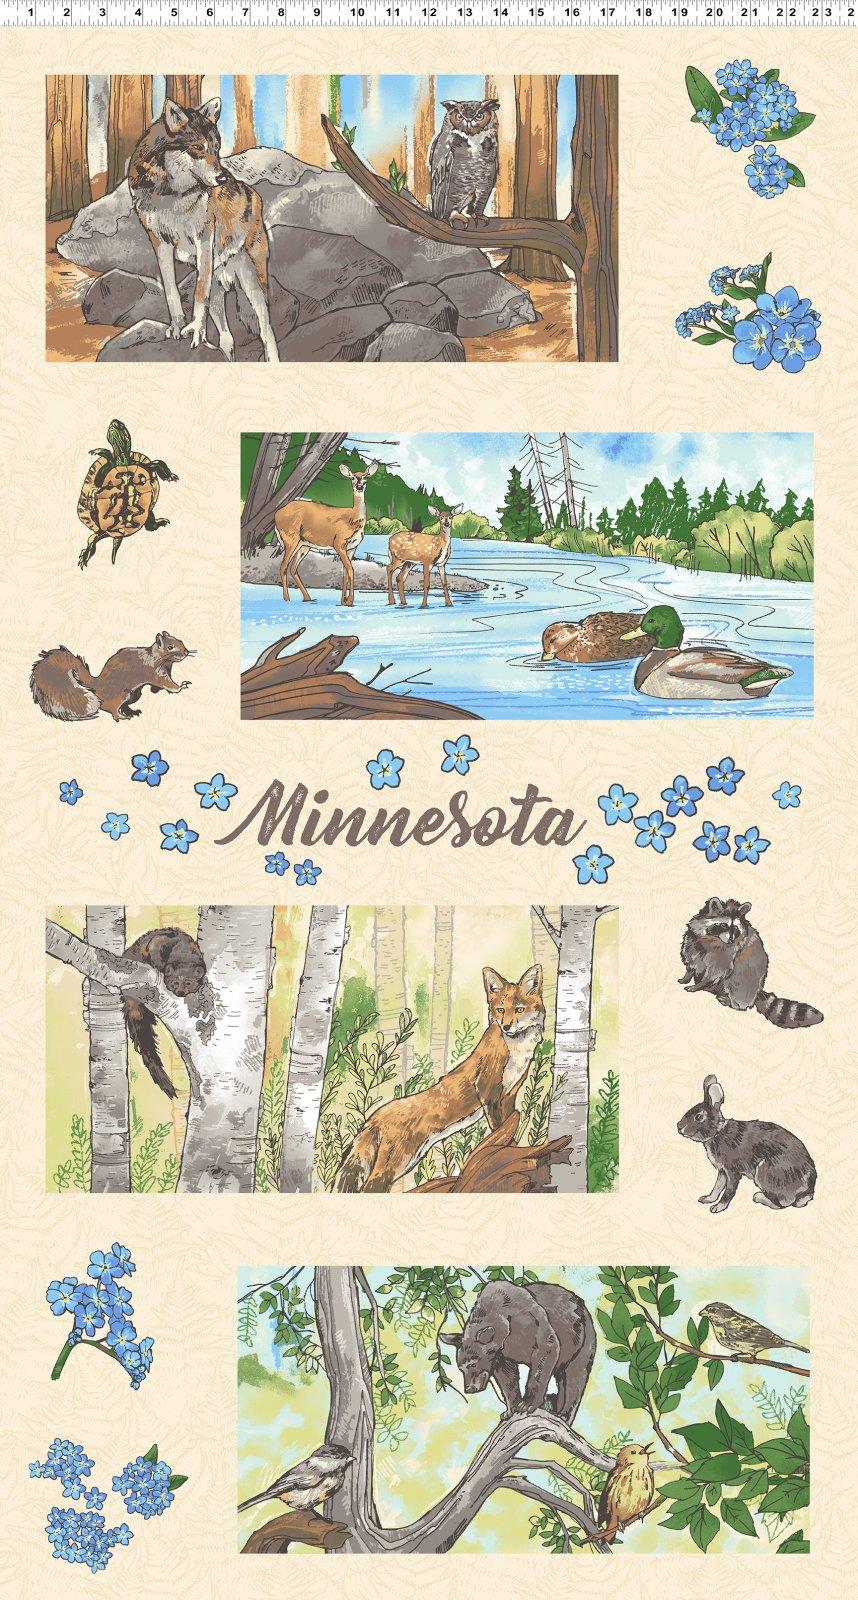 Quilt Minnesota 2019 Panels 16 x 8 (Y2740-64)